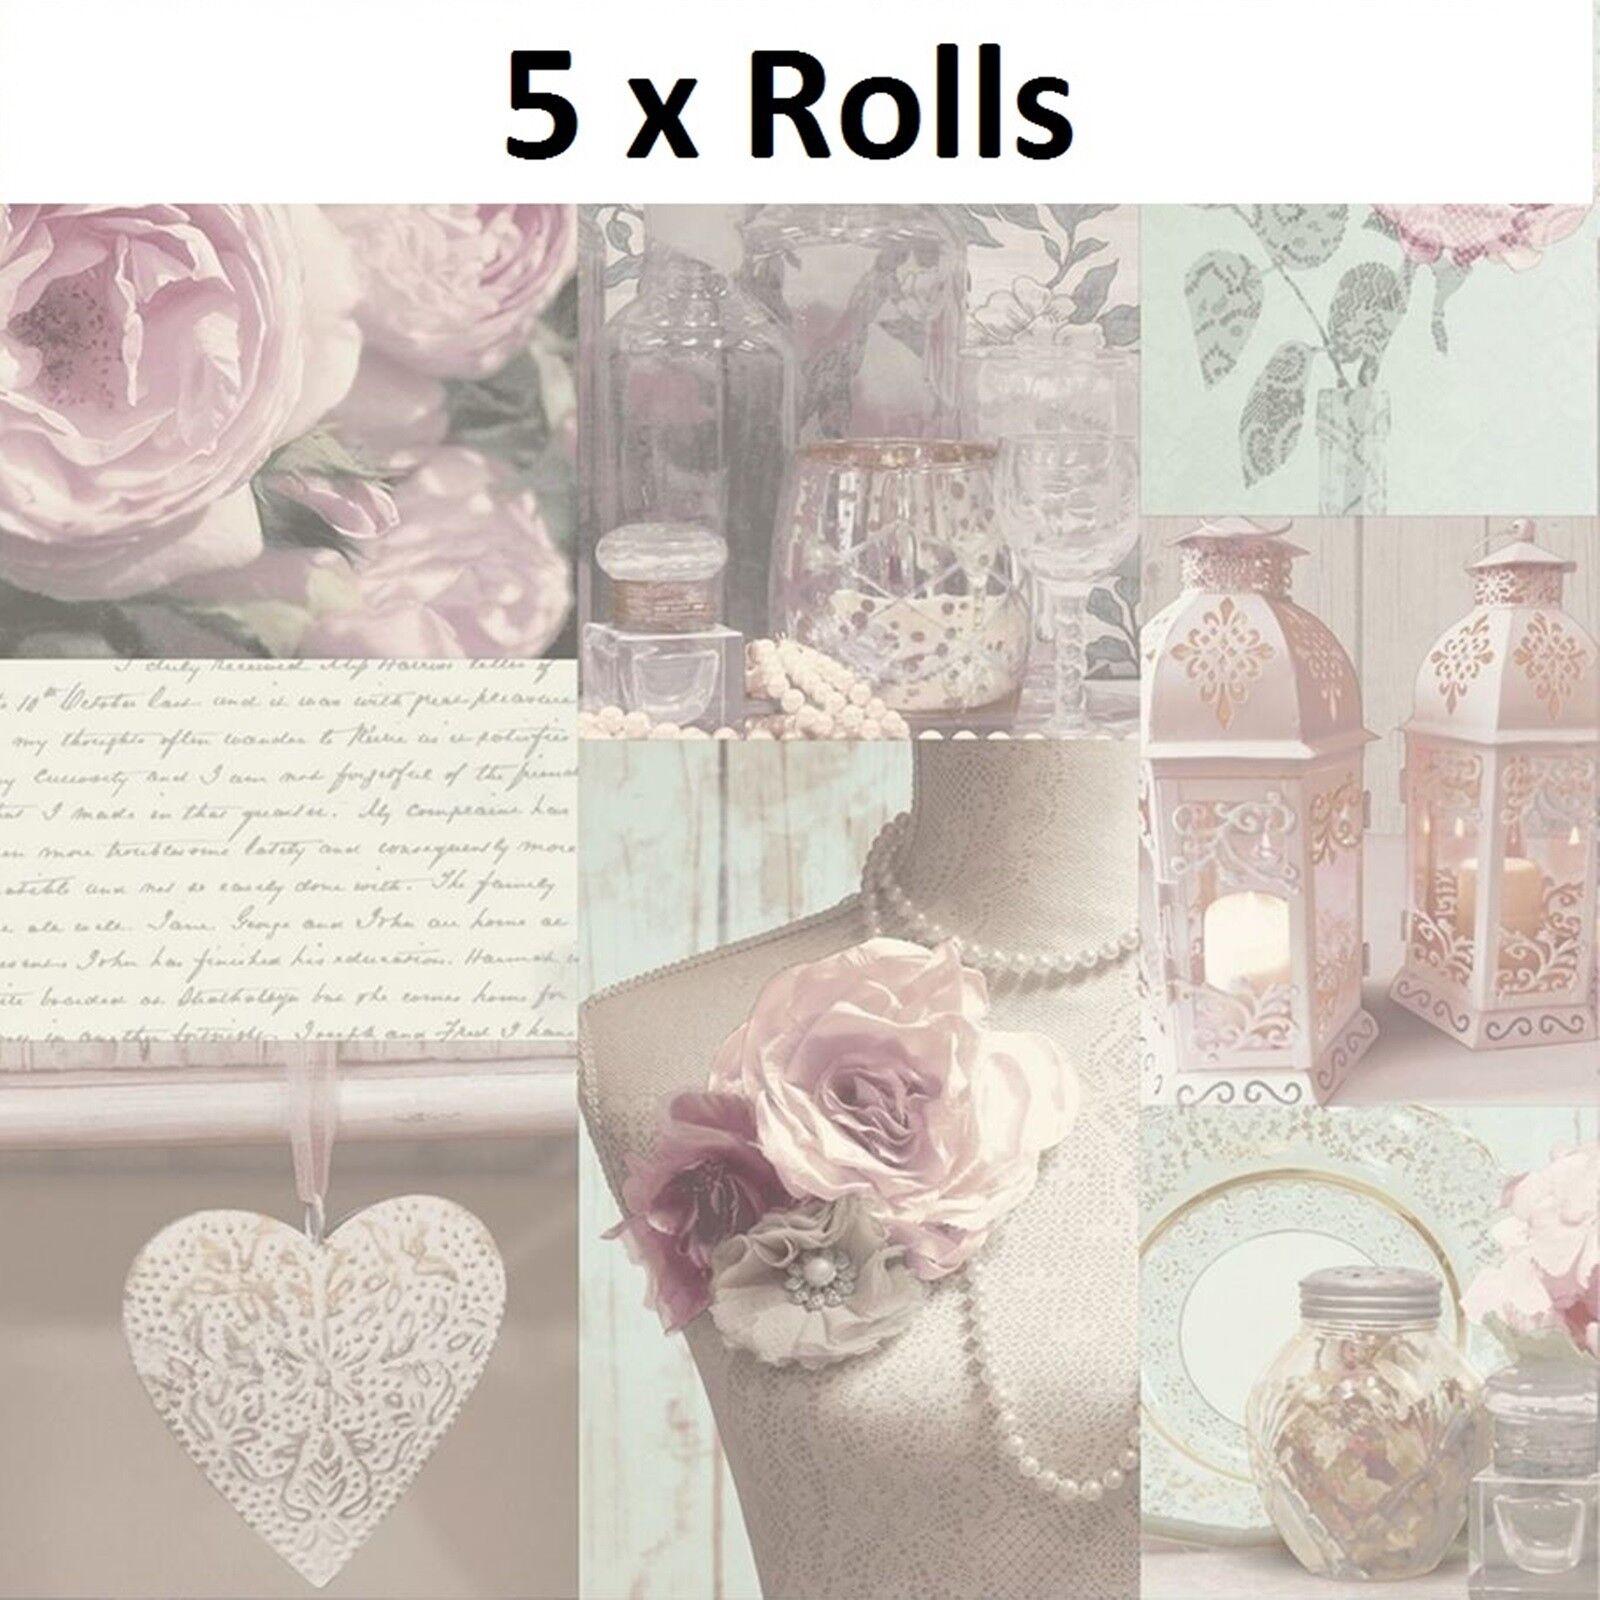 5 ROLLS CHARLOTTE blueSH HEARTS SCRIPT FLORAL FLOWERS QUALITY ARTHOUSE WALLPAPER